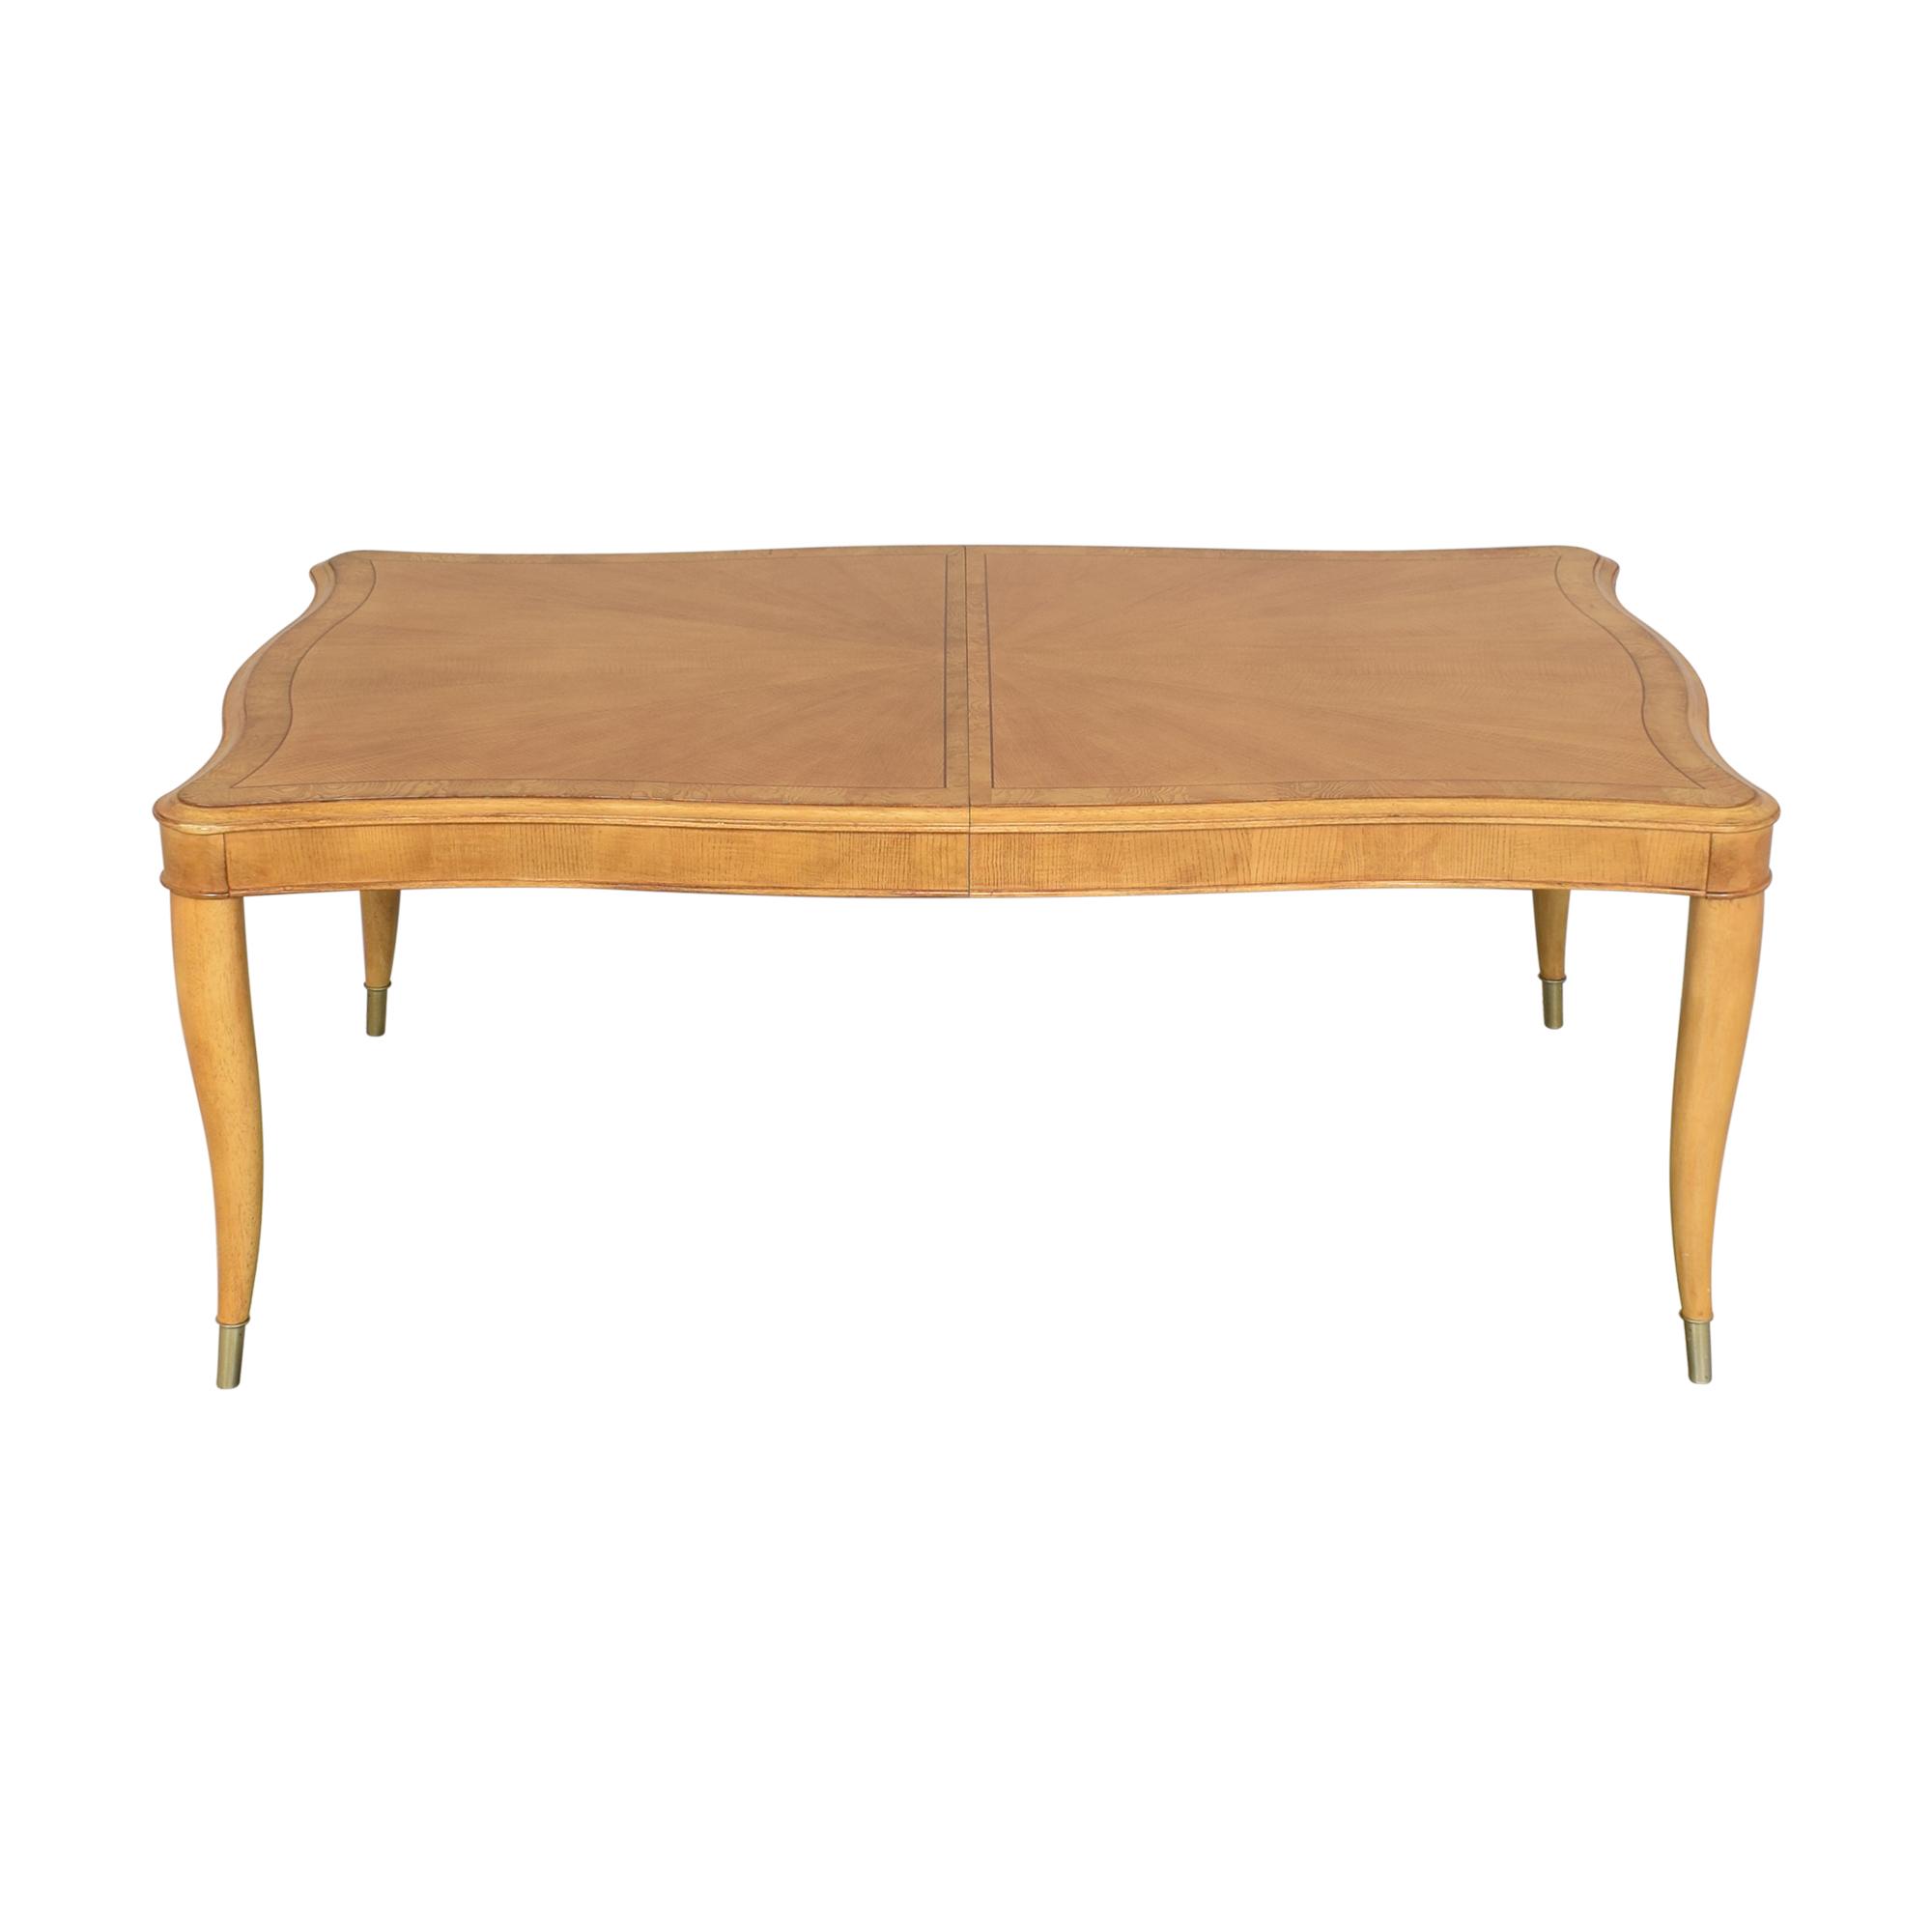 Bernhardt Bernhardt Extendable Dining Table for sale